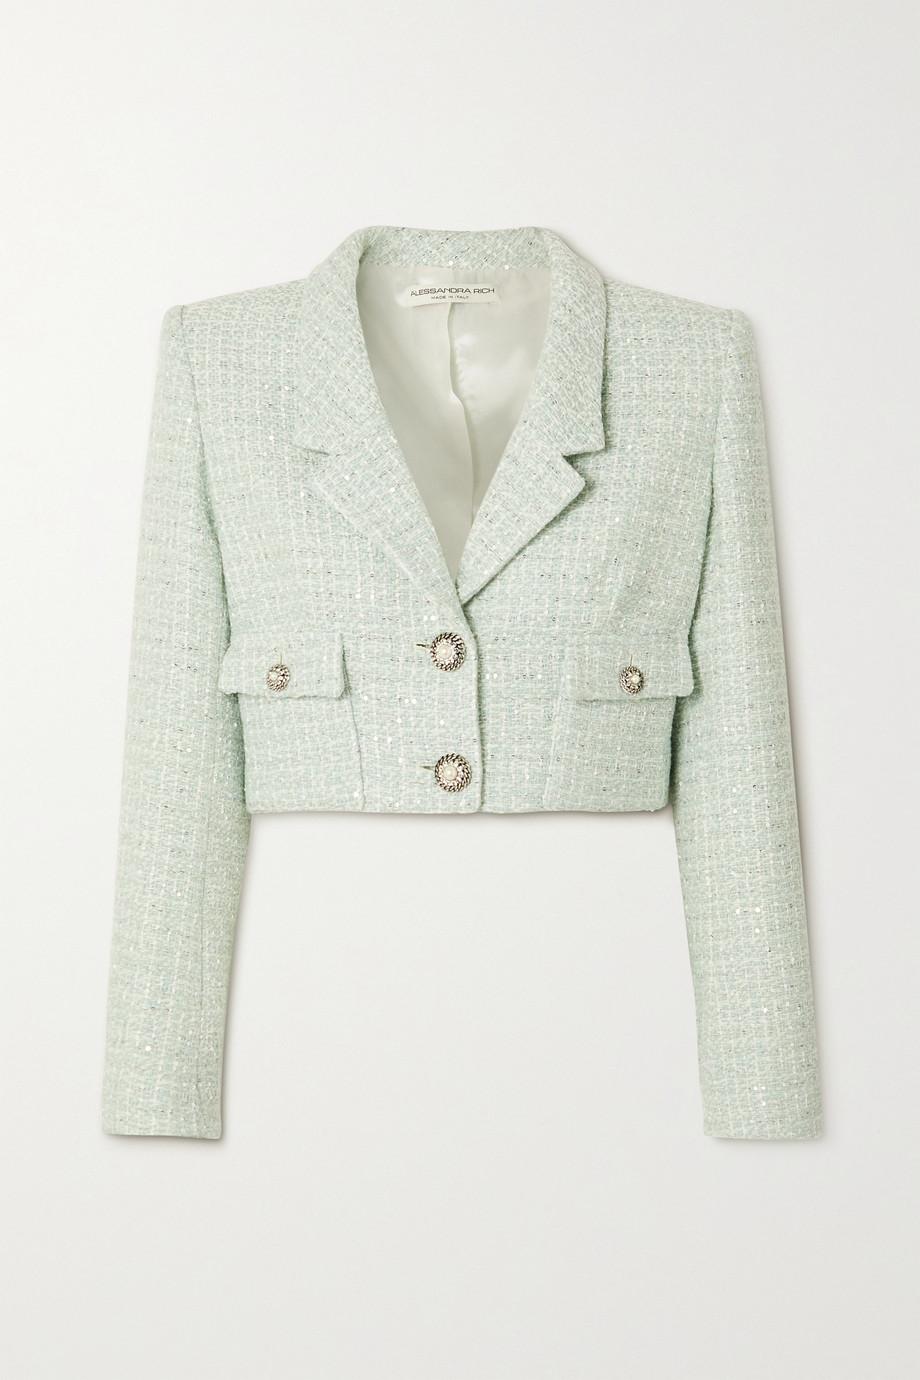 Alessandra Rich Cropped embellished sequined wool-blend tweed jacket